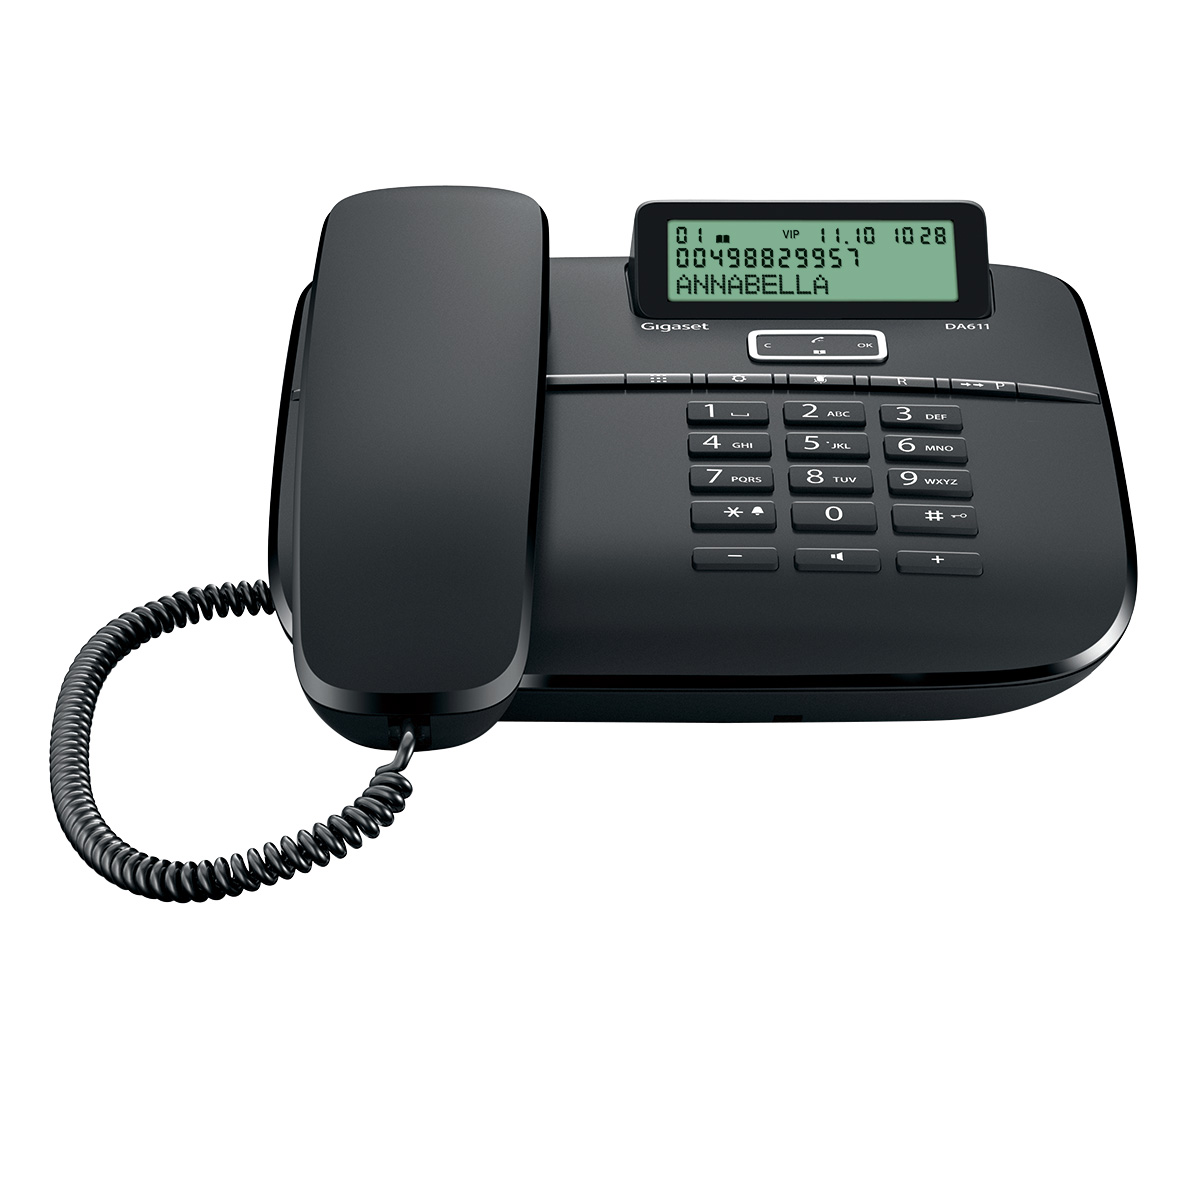 Gigaset DECT DA611 Black - 4250366858654